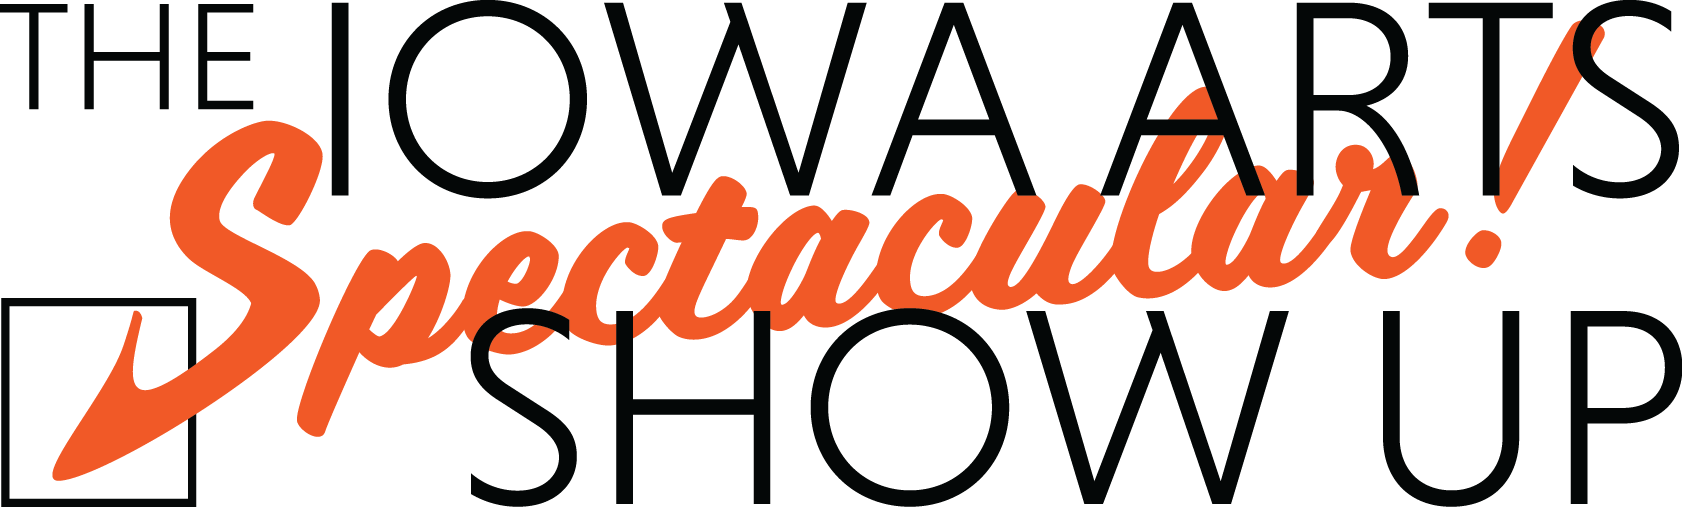 ShowUp_logo.png